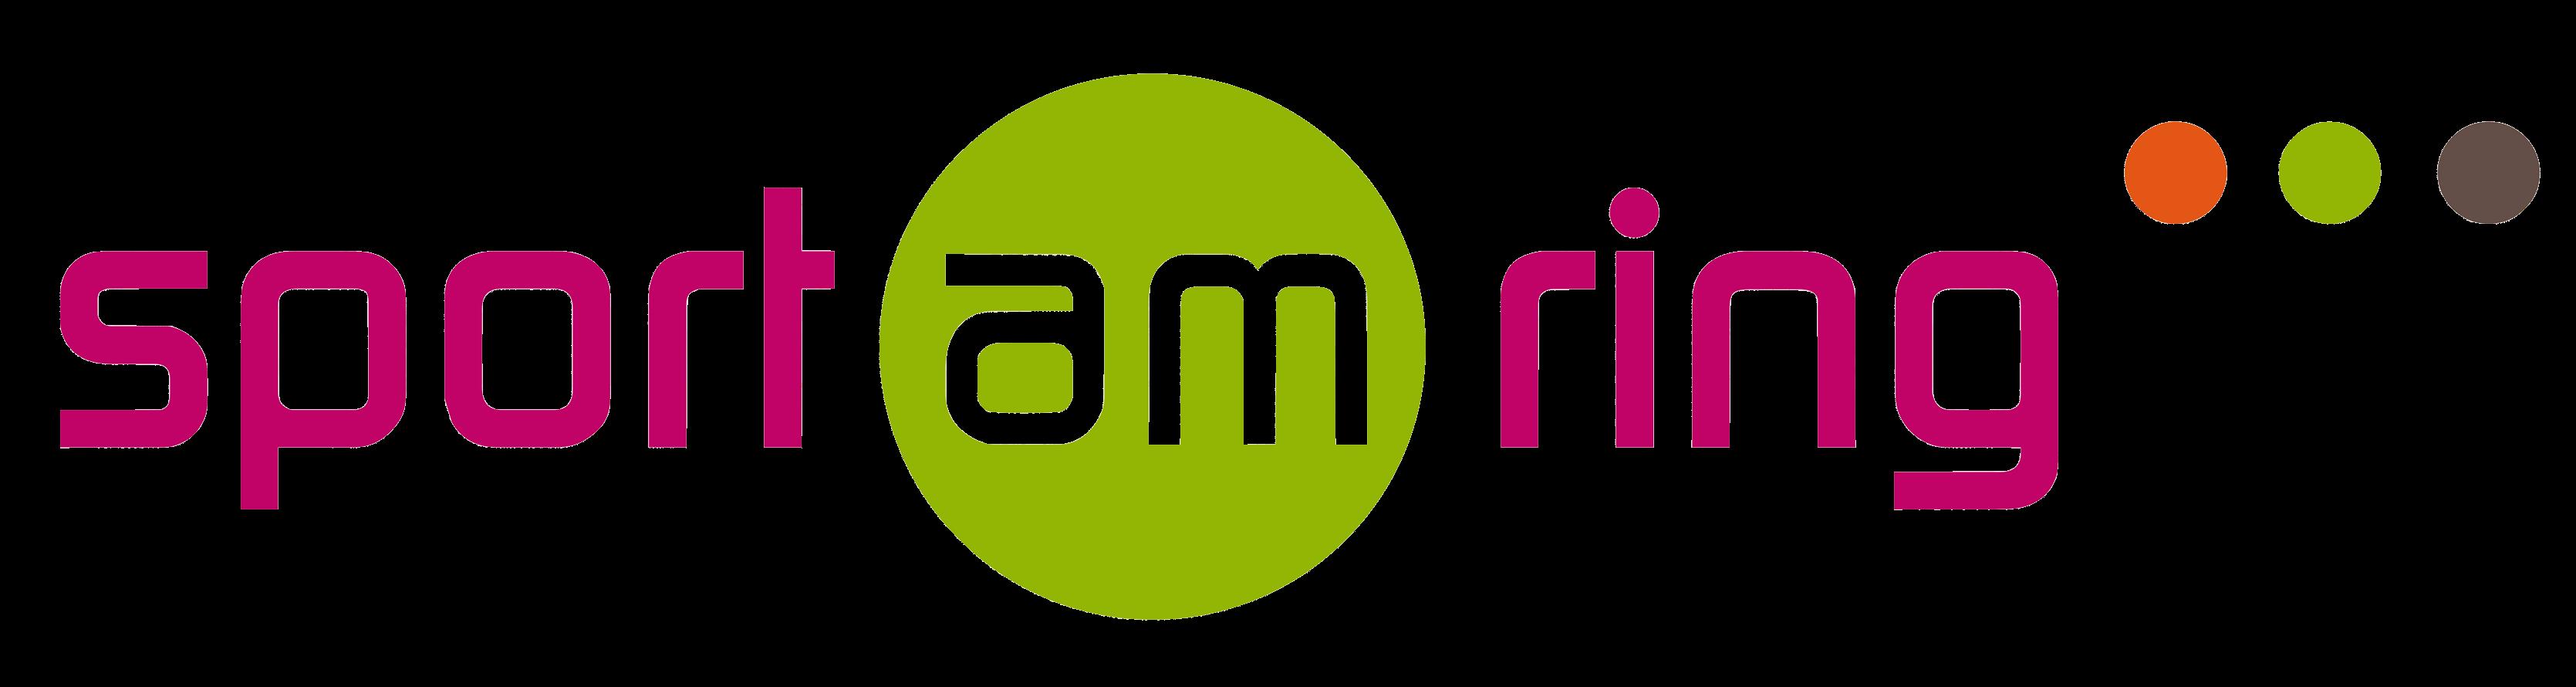 sport am ring logo transparent